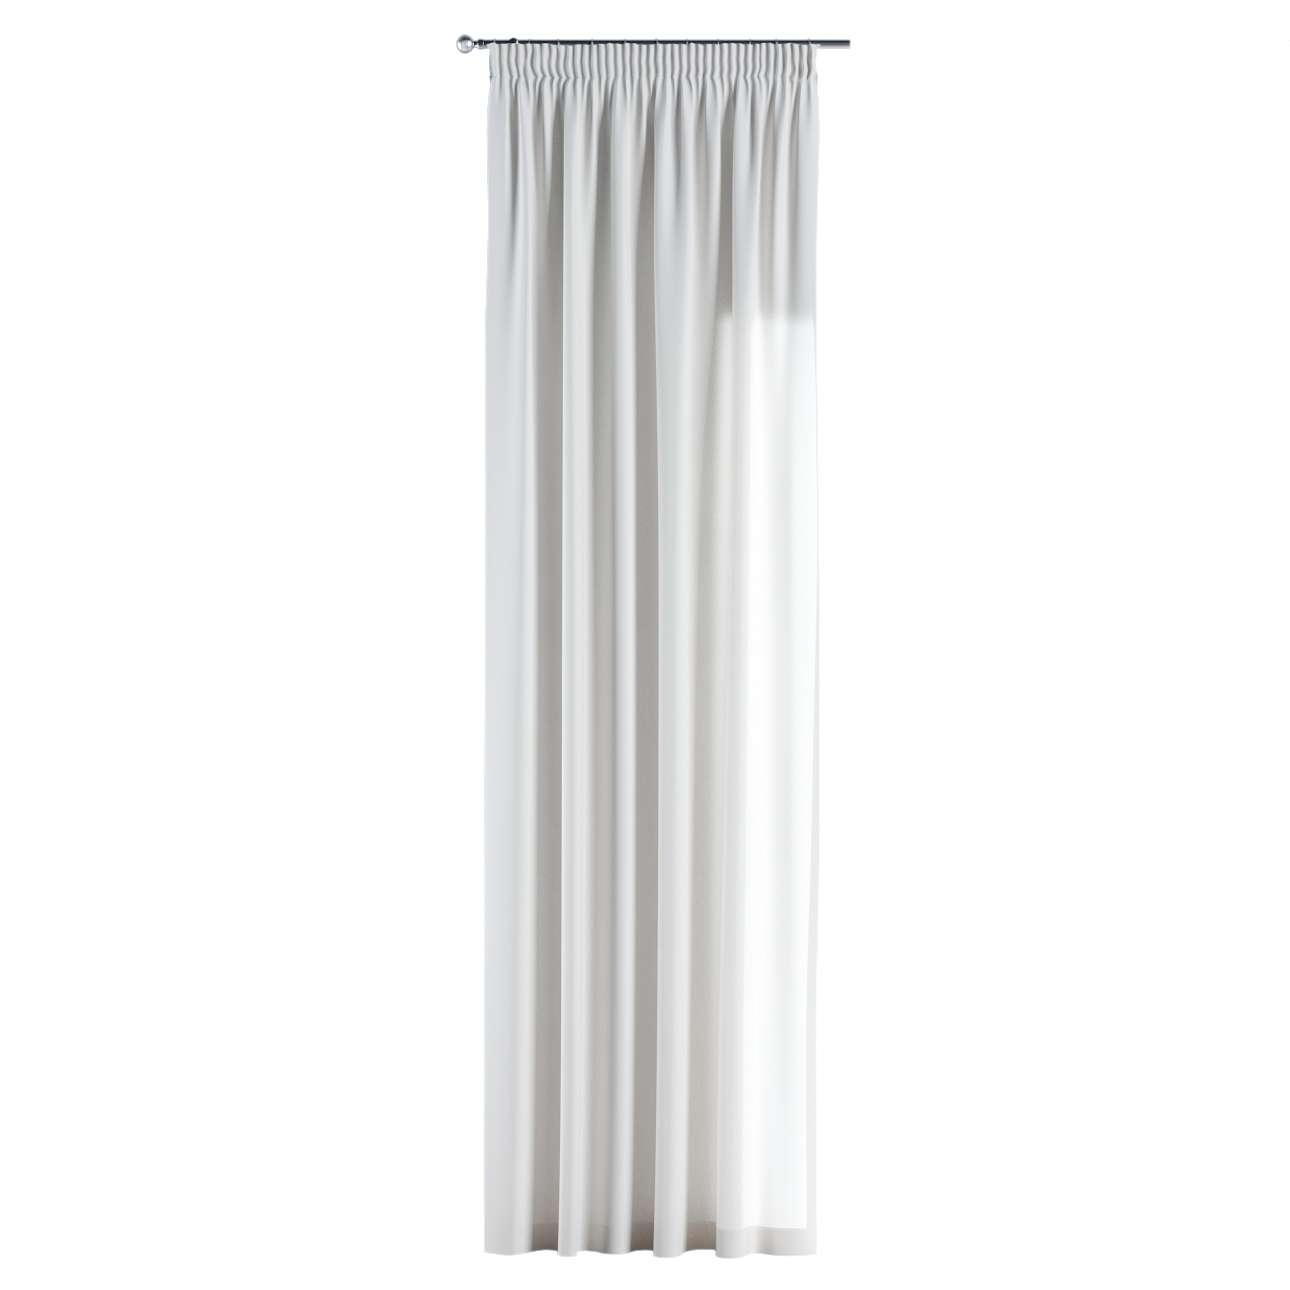 Gardin med rynkebånd 130 x 260 cm fra kollektionen Comics, Stof: 139-00